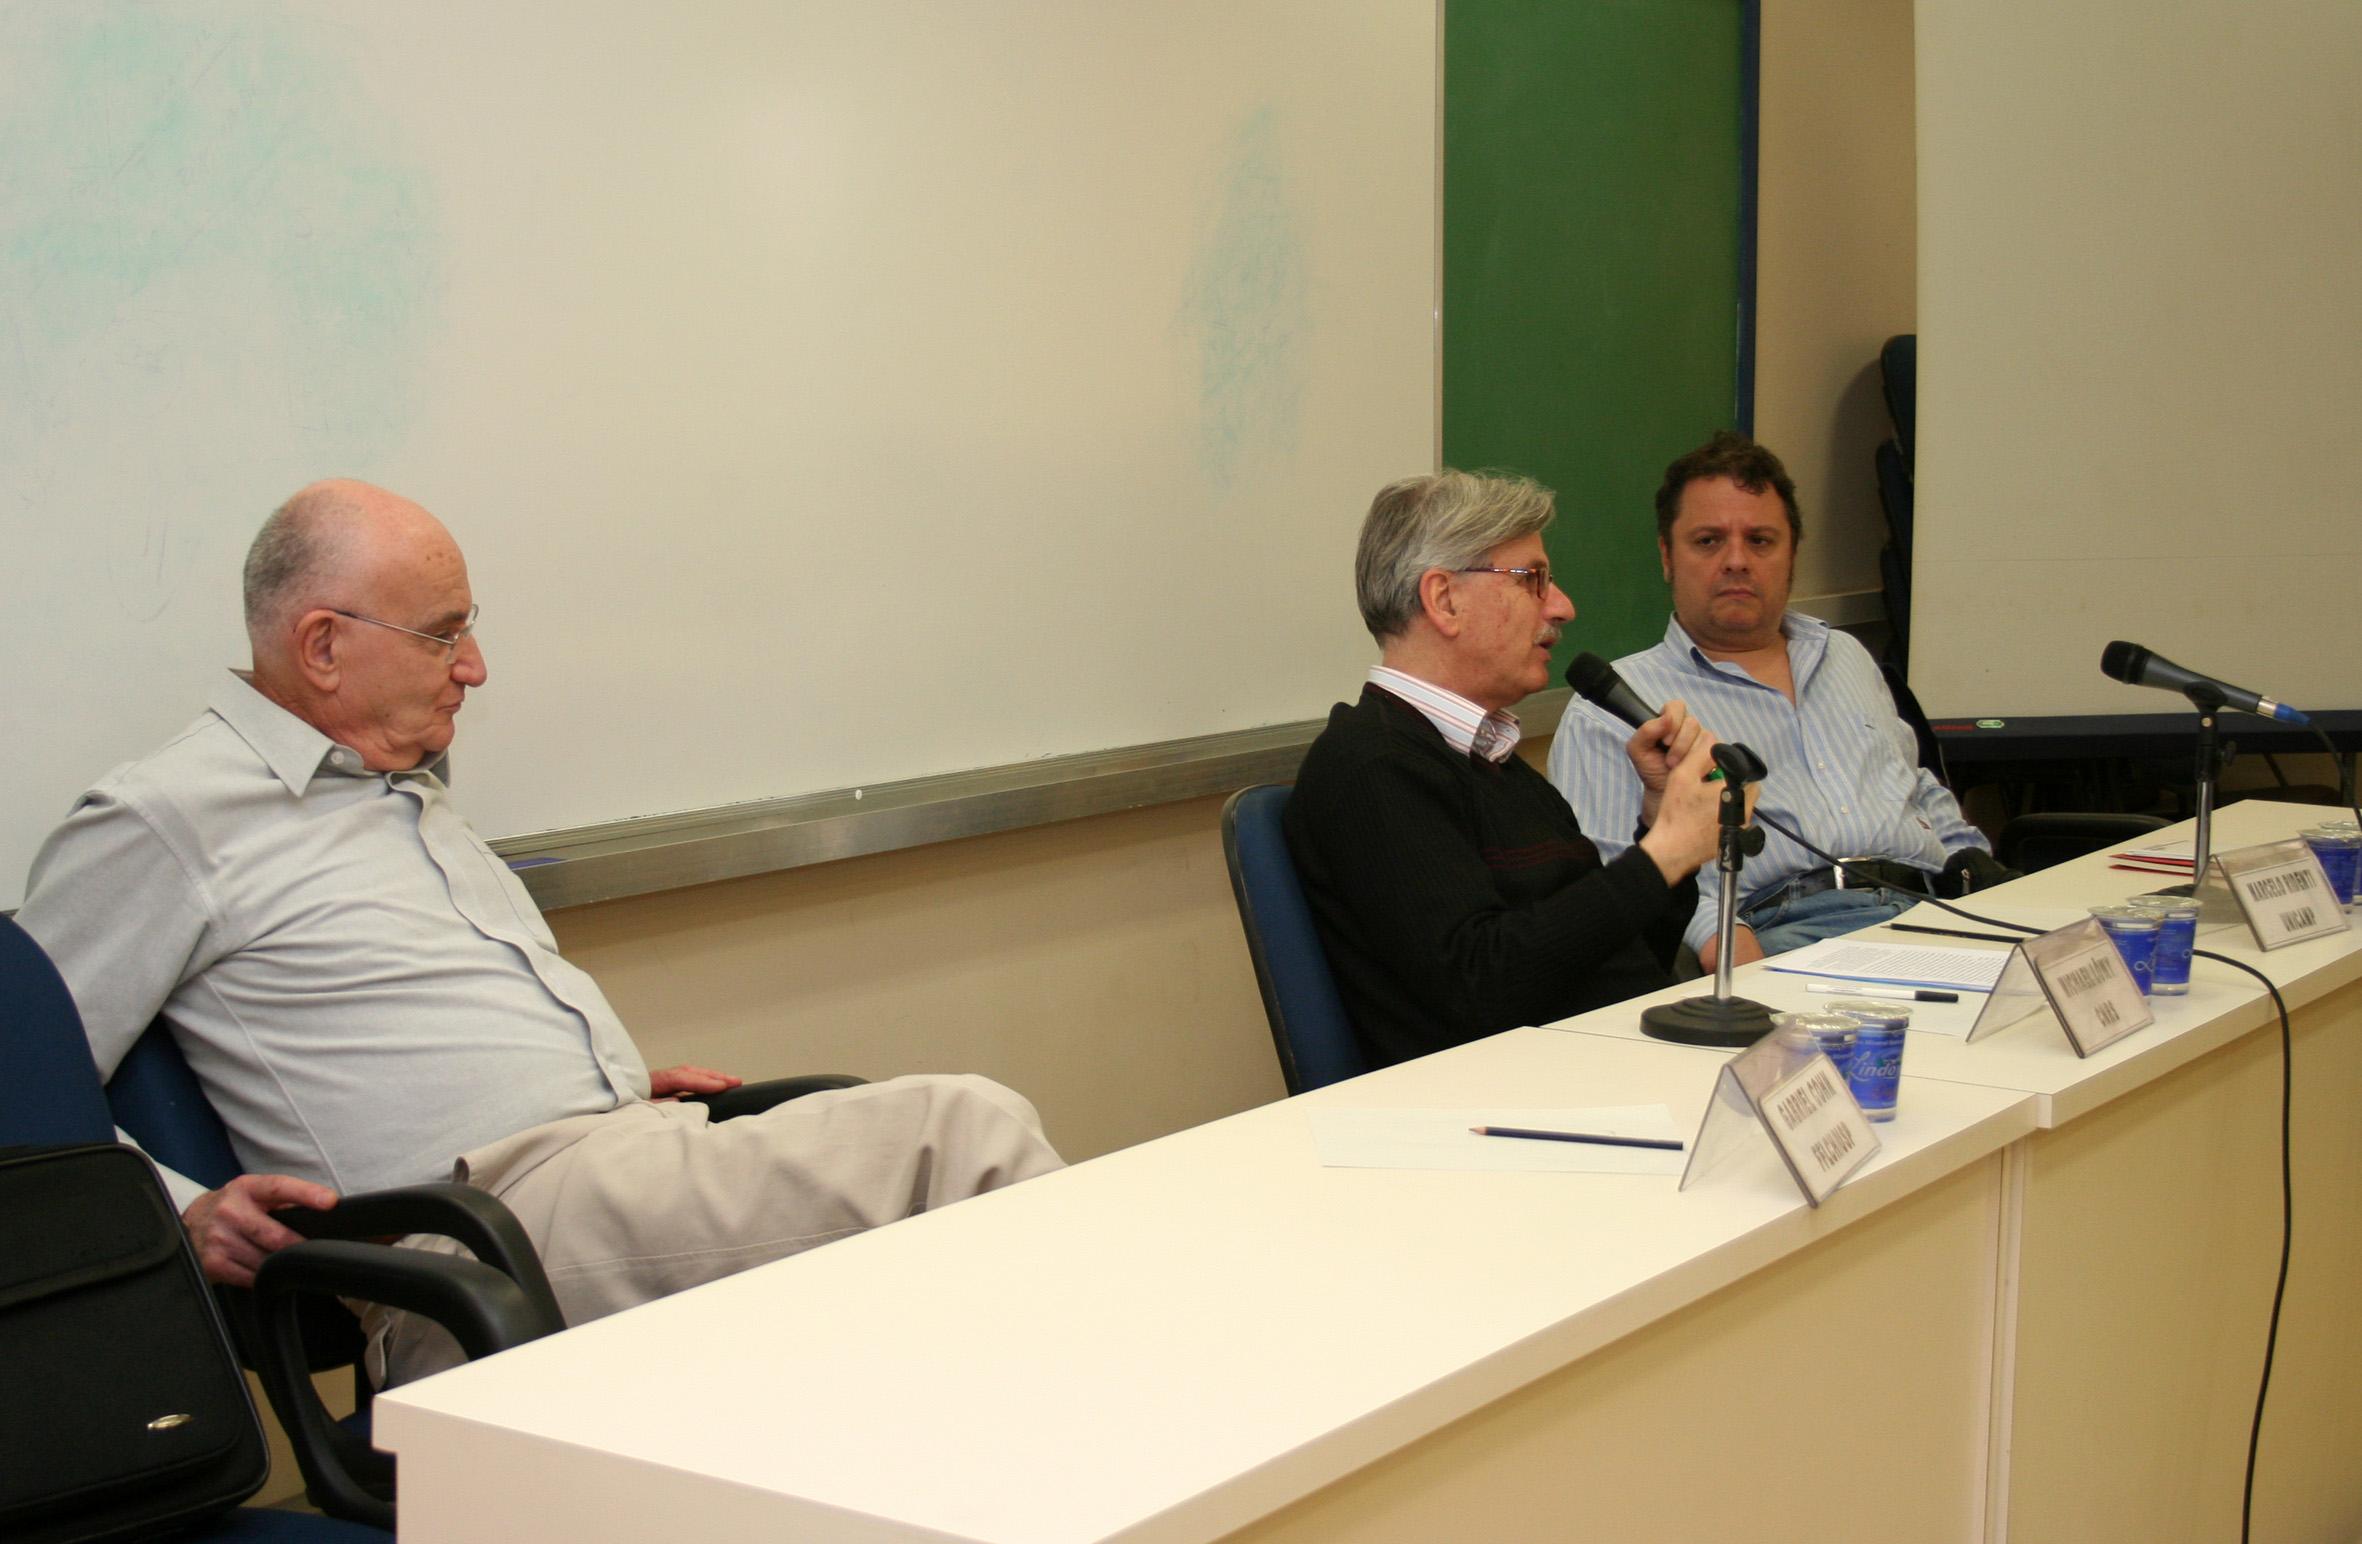 Gabriel Cohn, Michael Lövy e Marcelo Ridenti